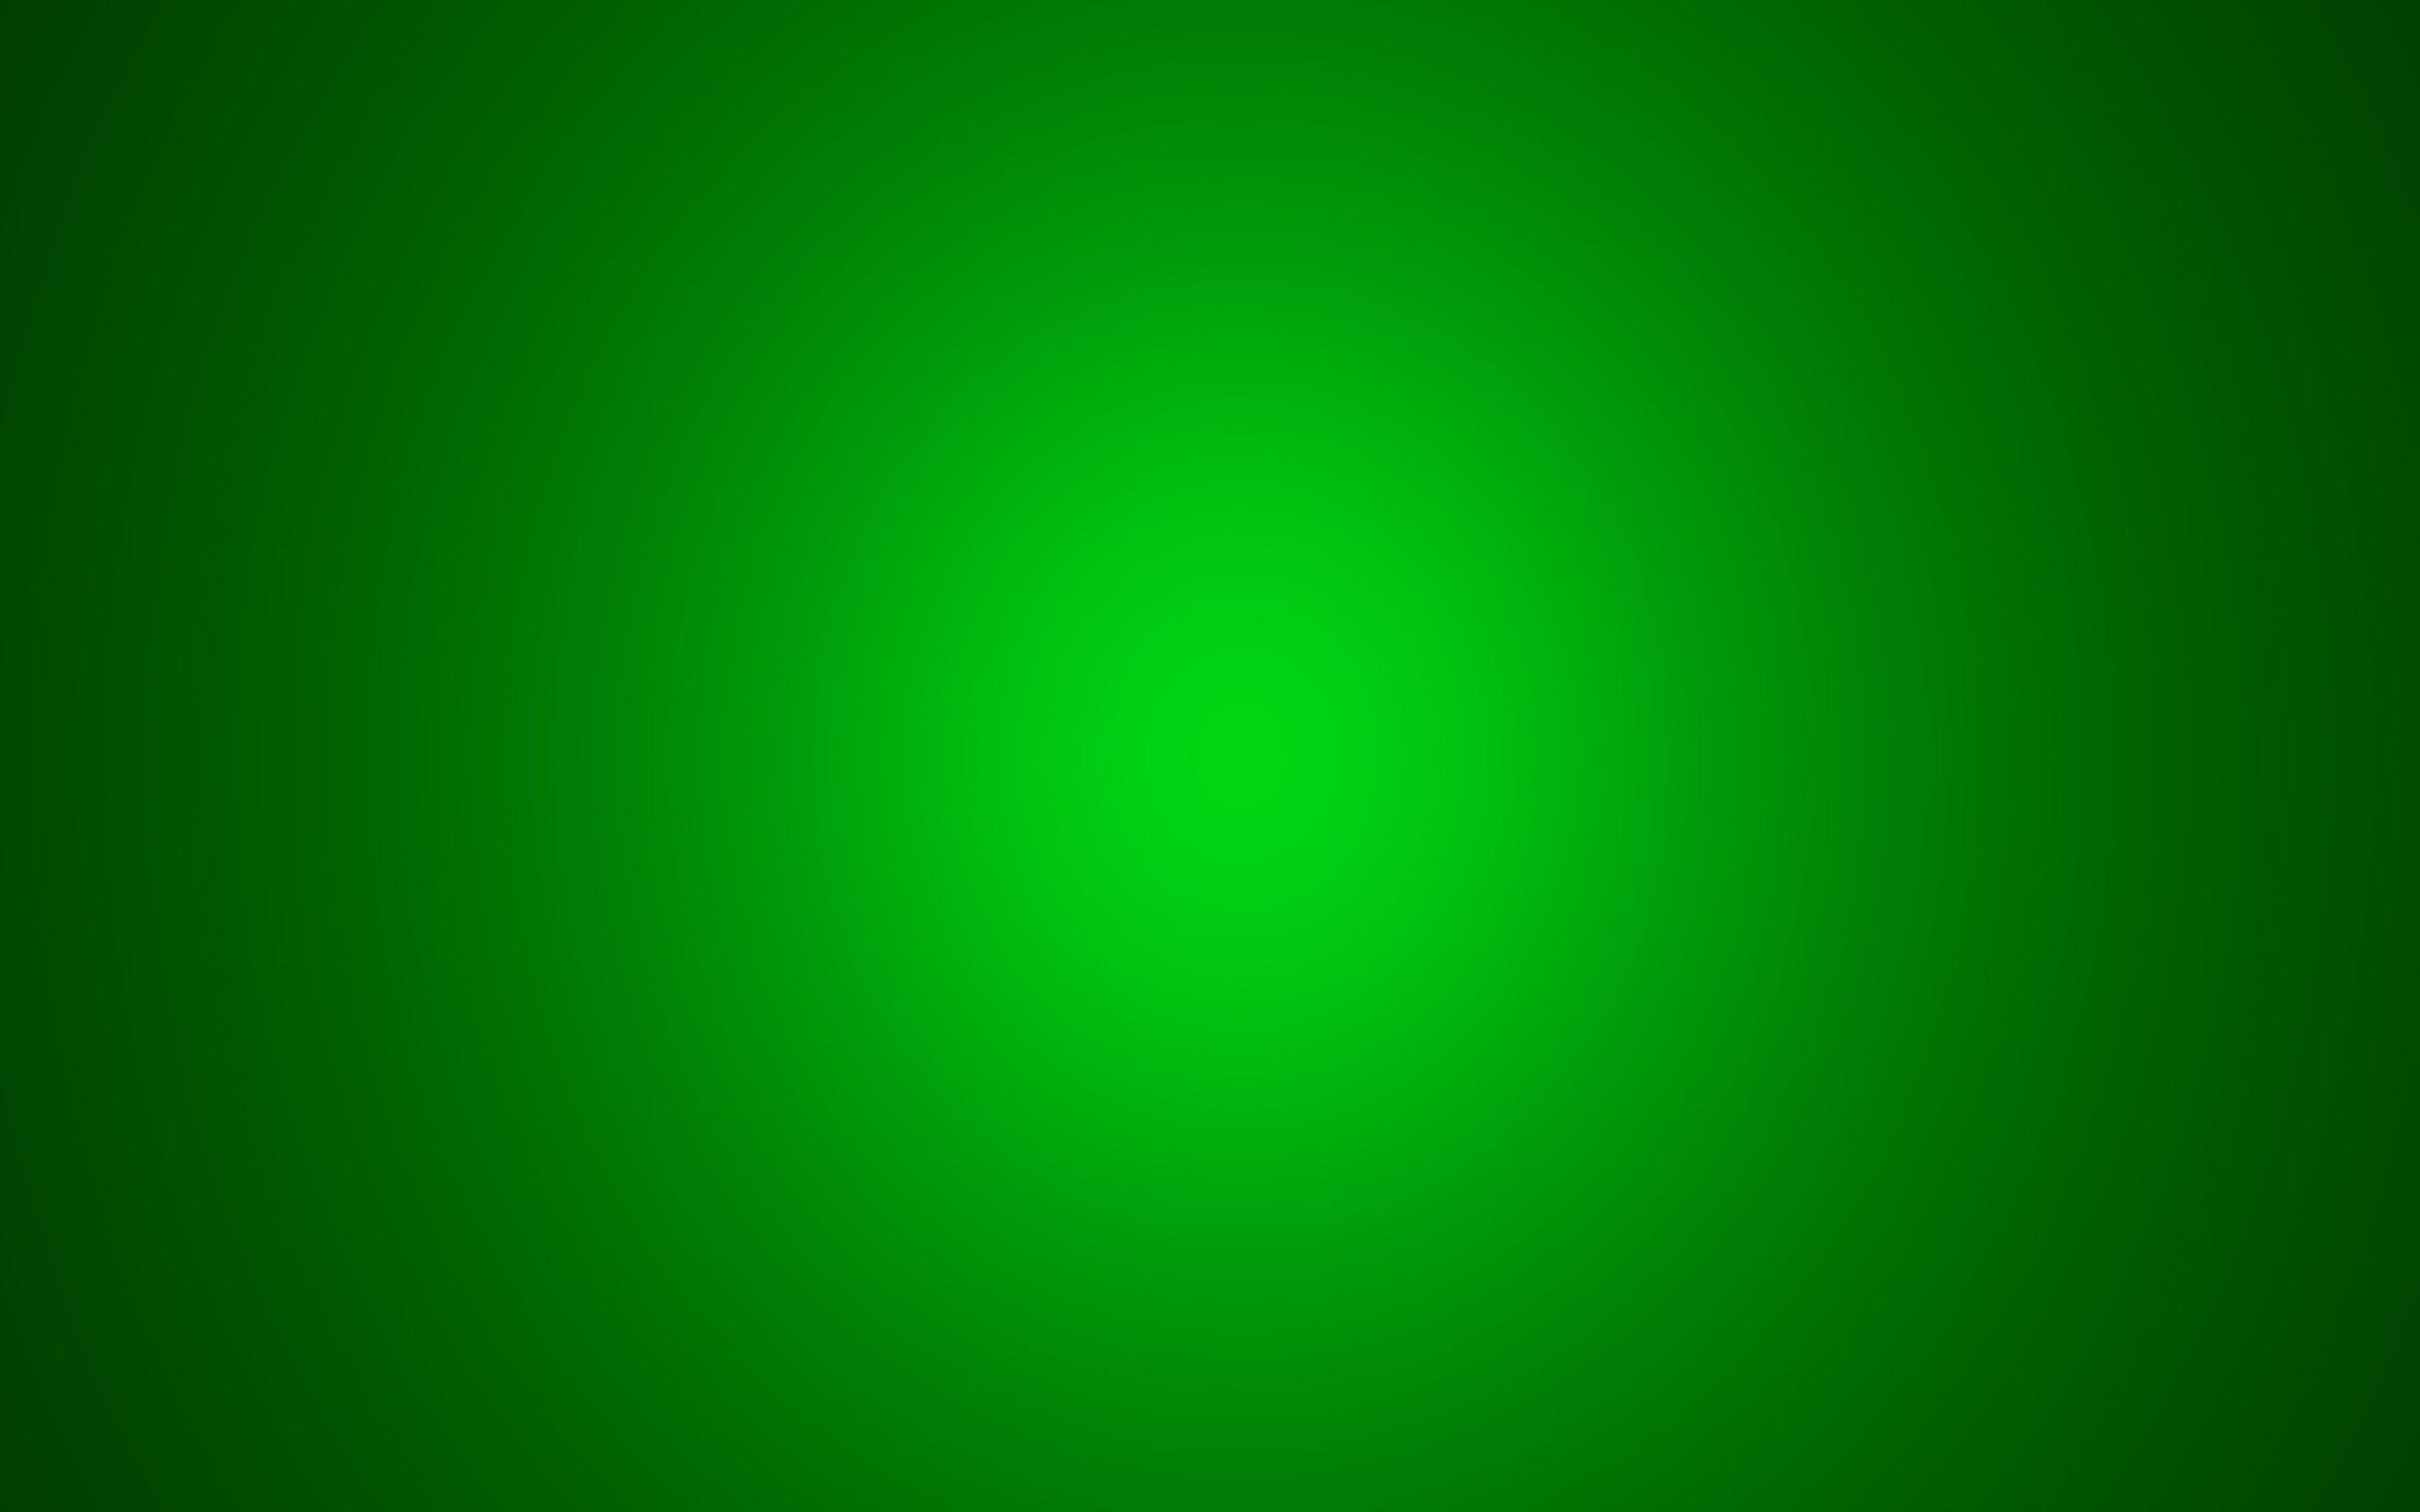 Simple Green Background 6781 2560 x 1600   WallpaperLayercom 2560x1600